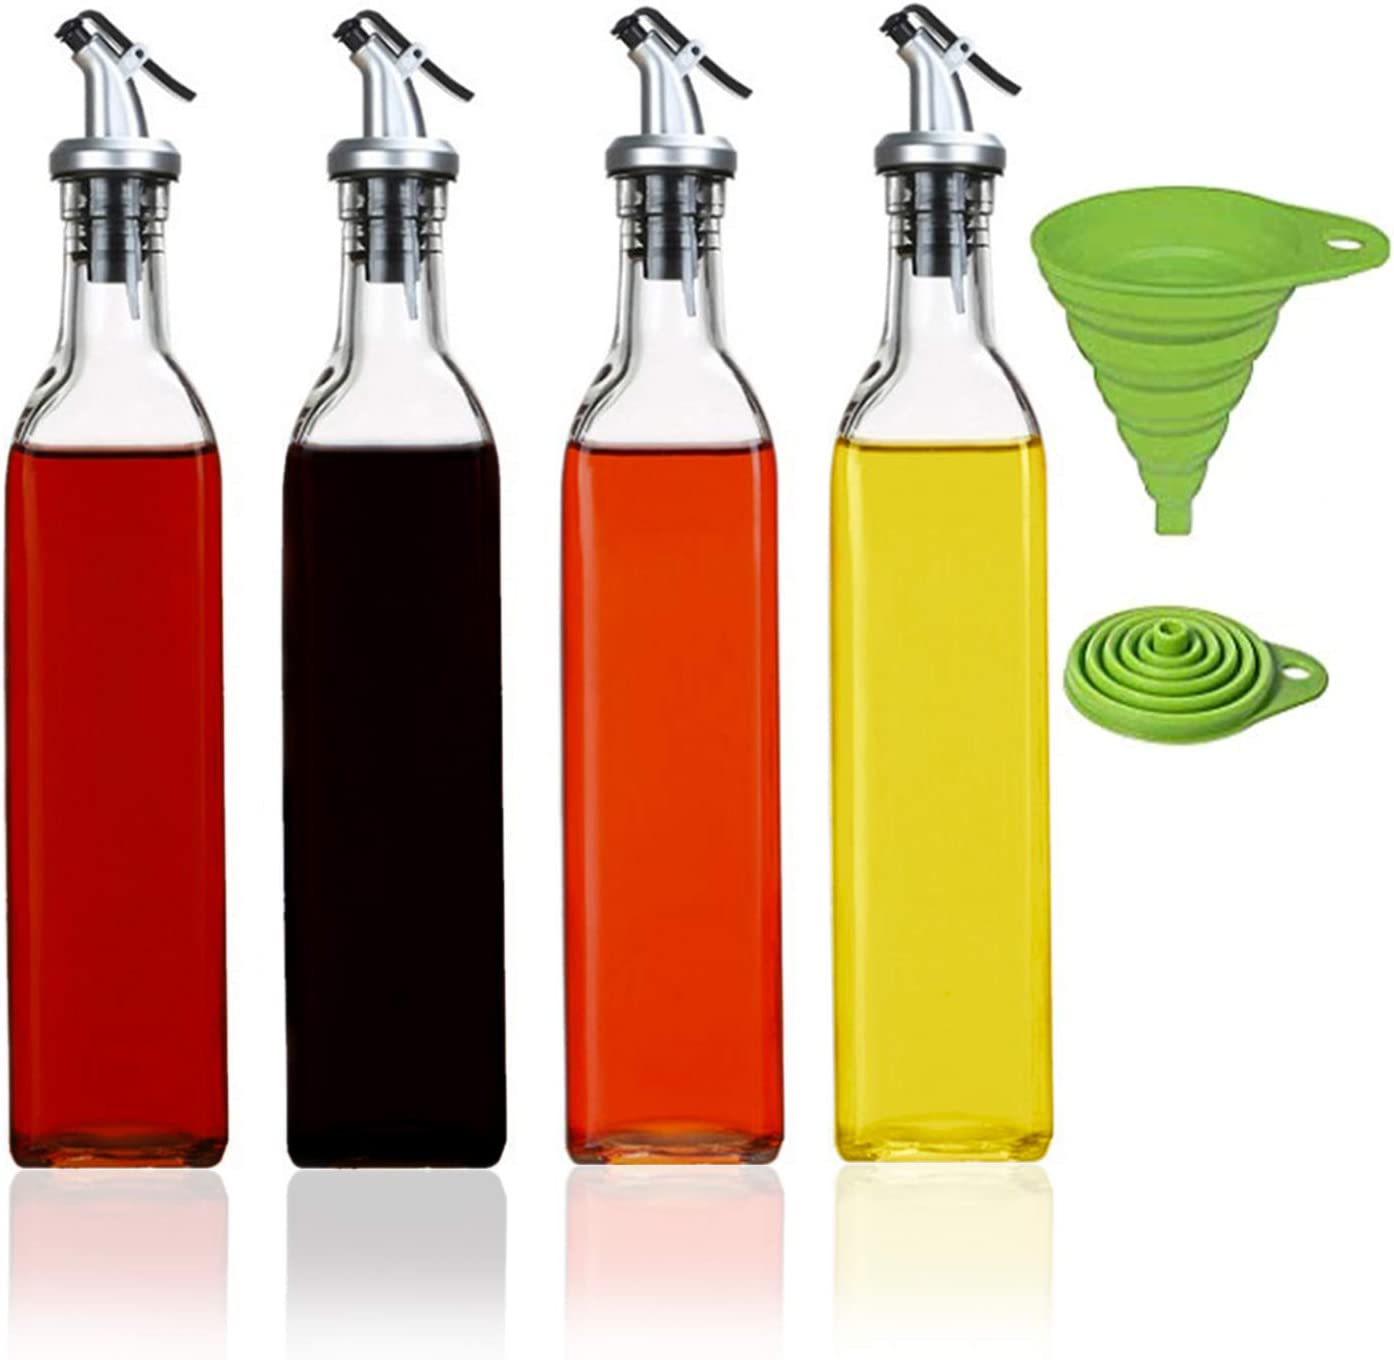 MFDSJ 17 Ounce Glass Oil Vinegar Dispenser Bottle with Silicone Collapsible Funnel, Leak Proof Oil Bottle Set for Kitchen Cooking, 4 Pack